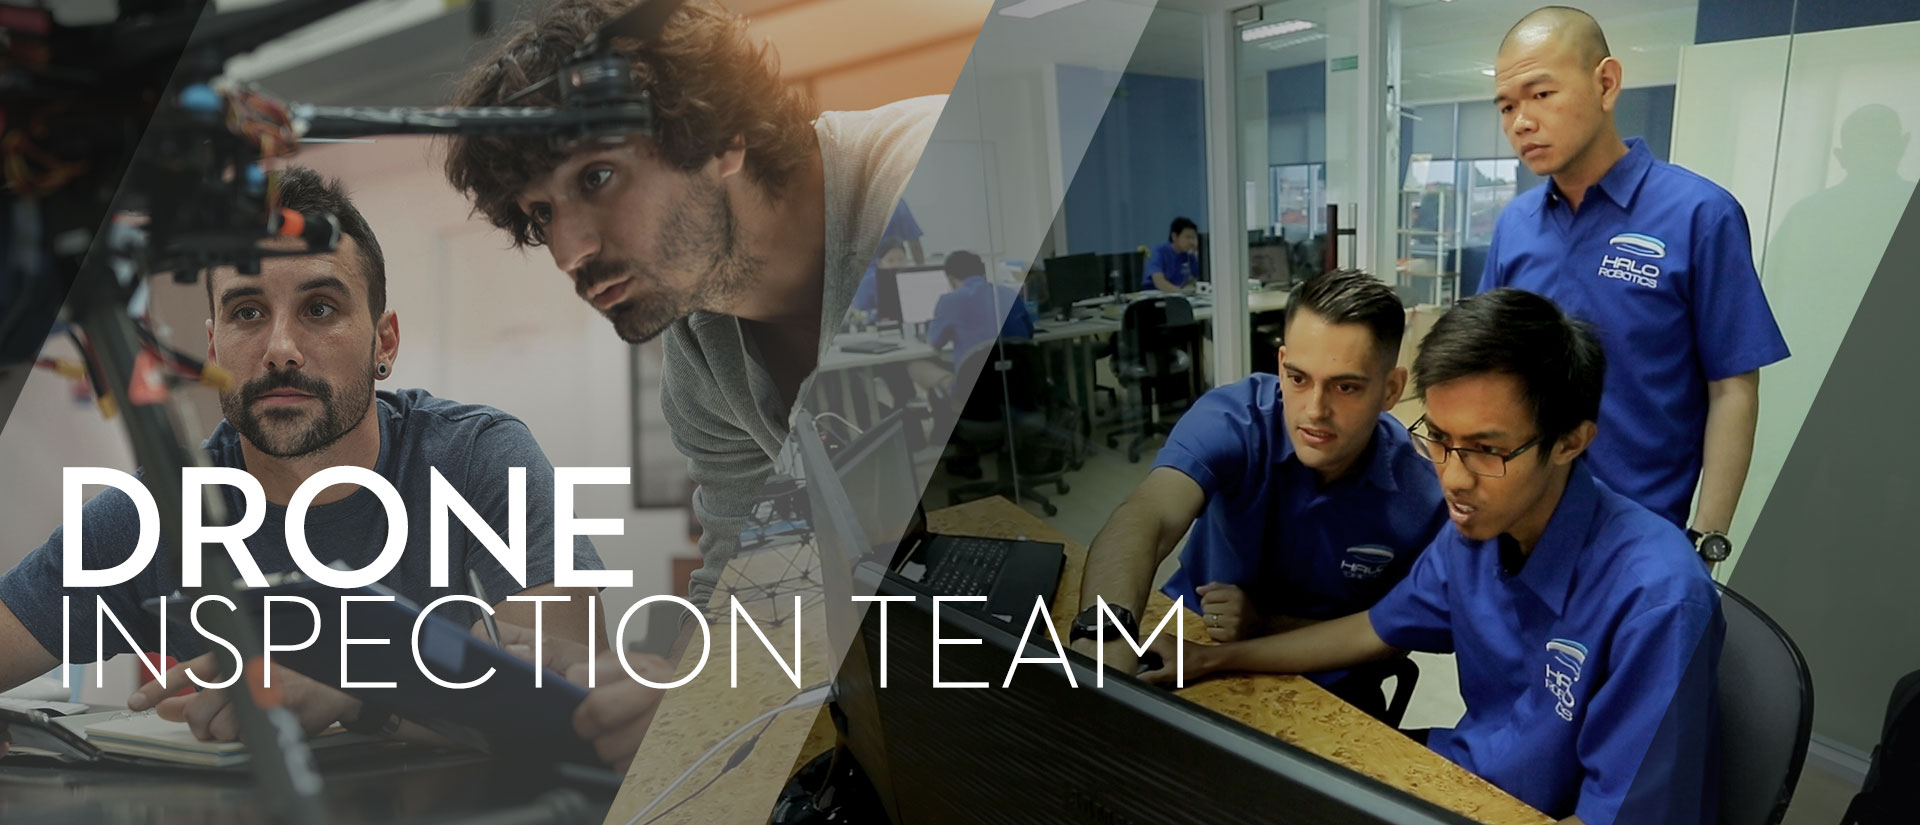 Blog-Drone-Inspection-Team